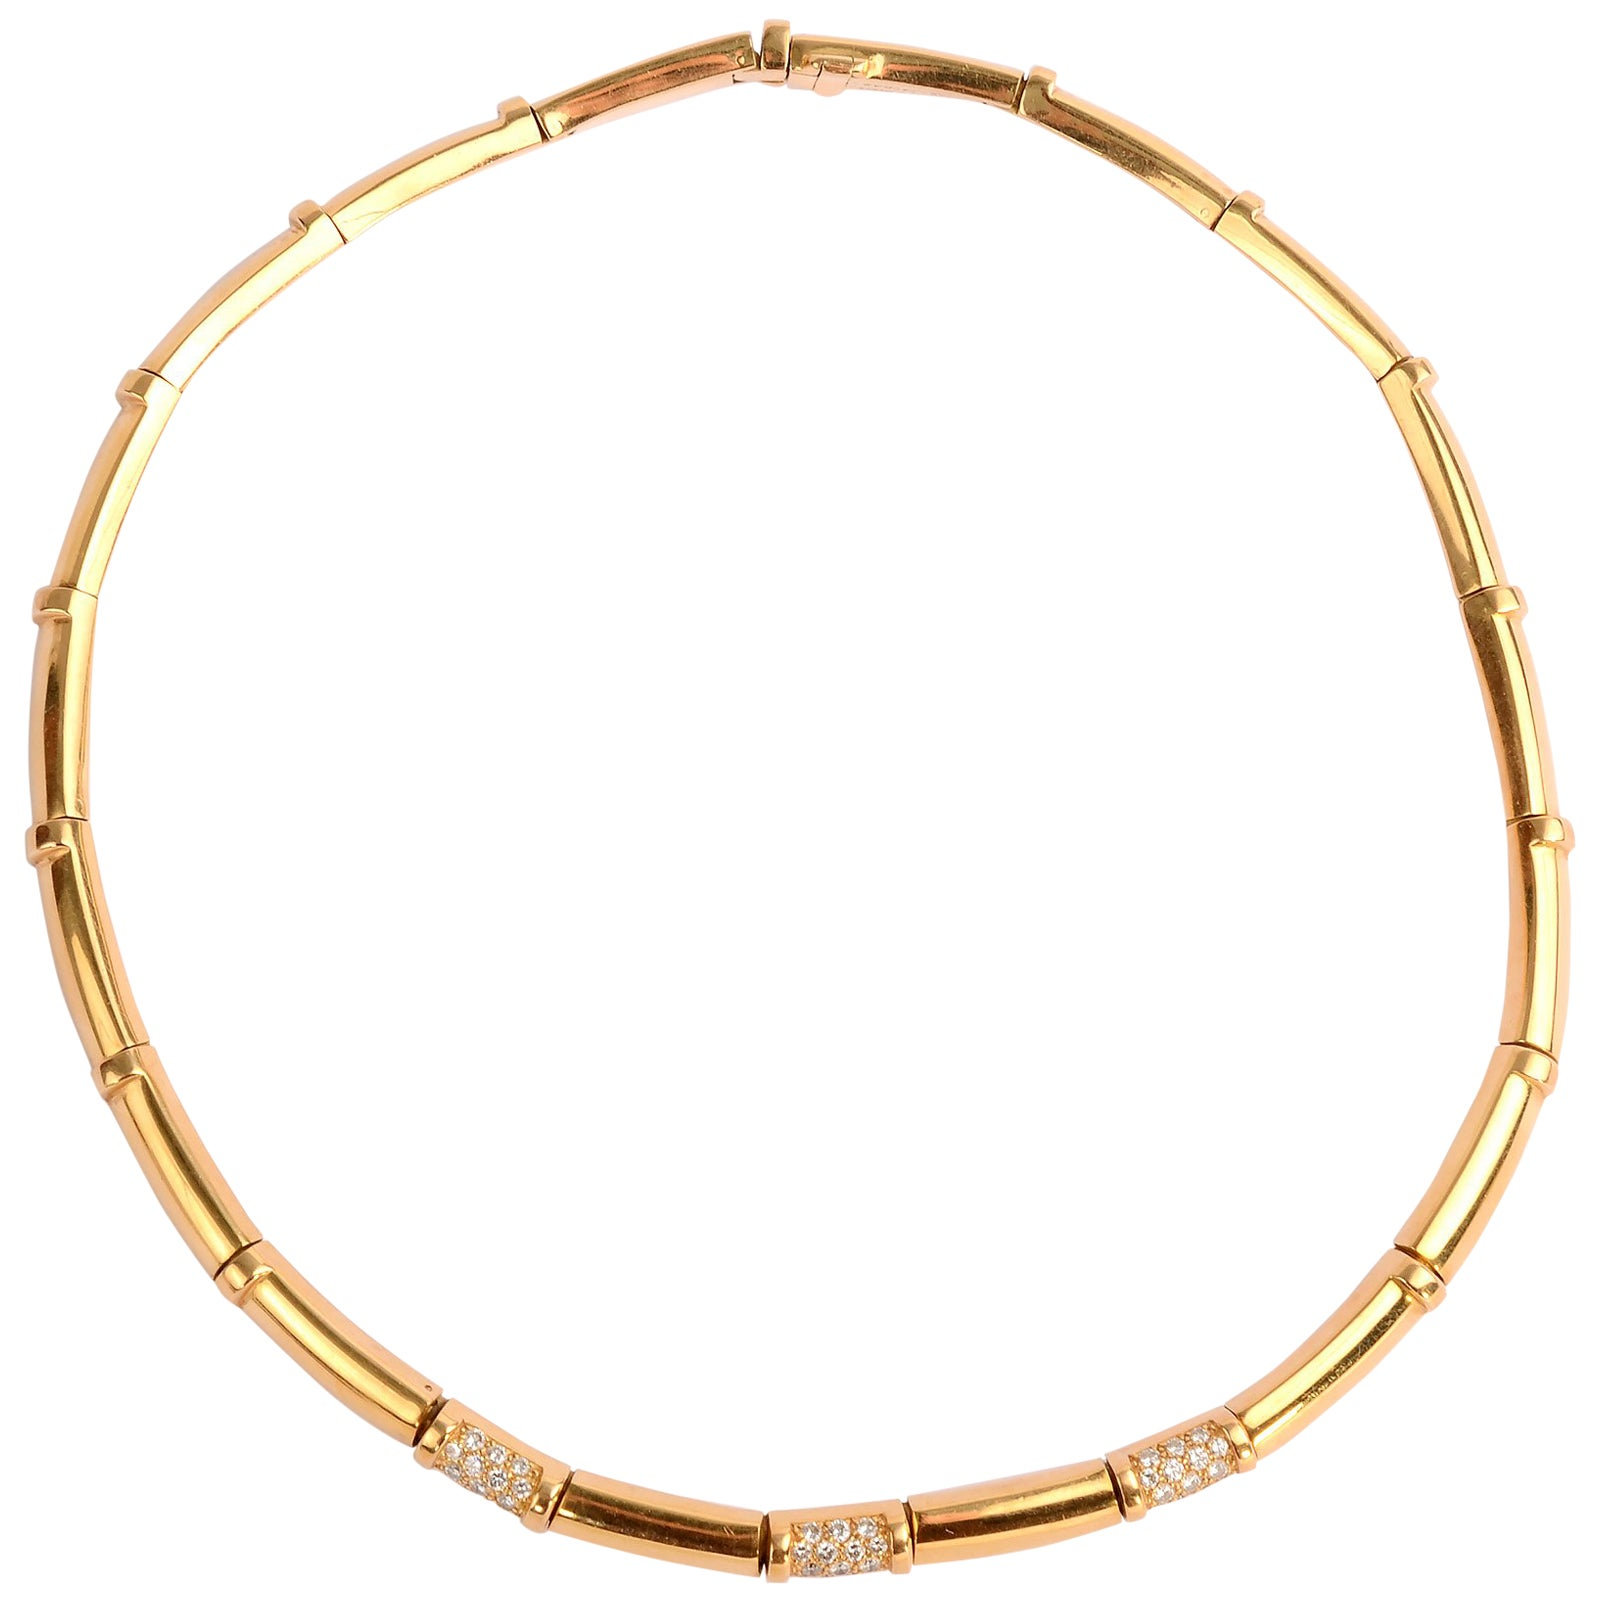 Chaumet Gold Diamond Choker Necklace